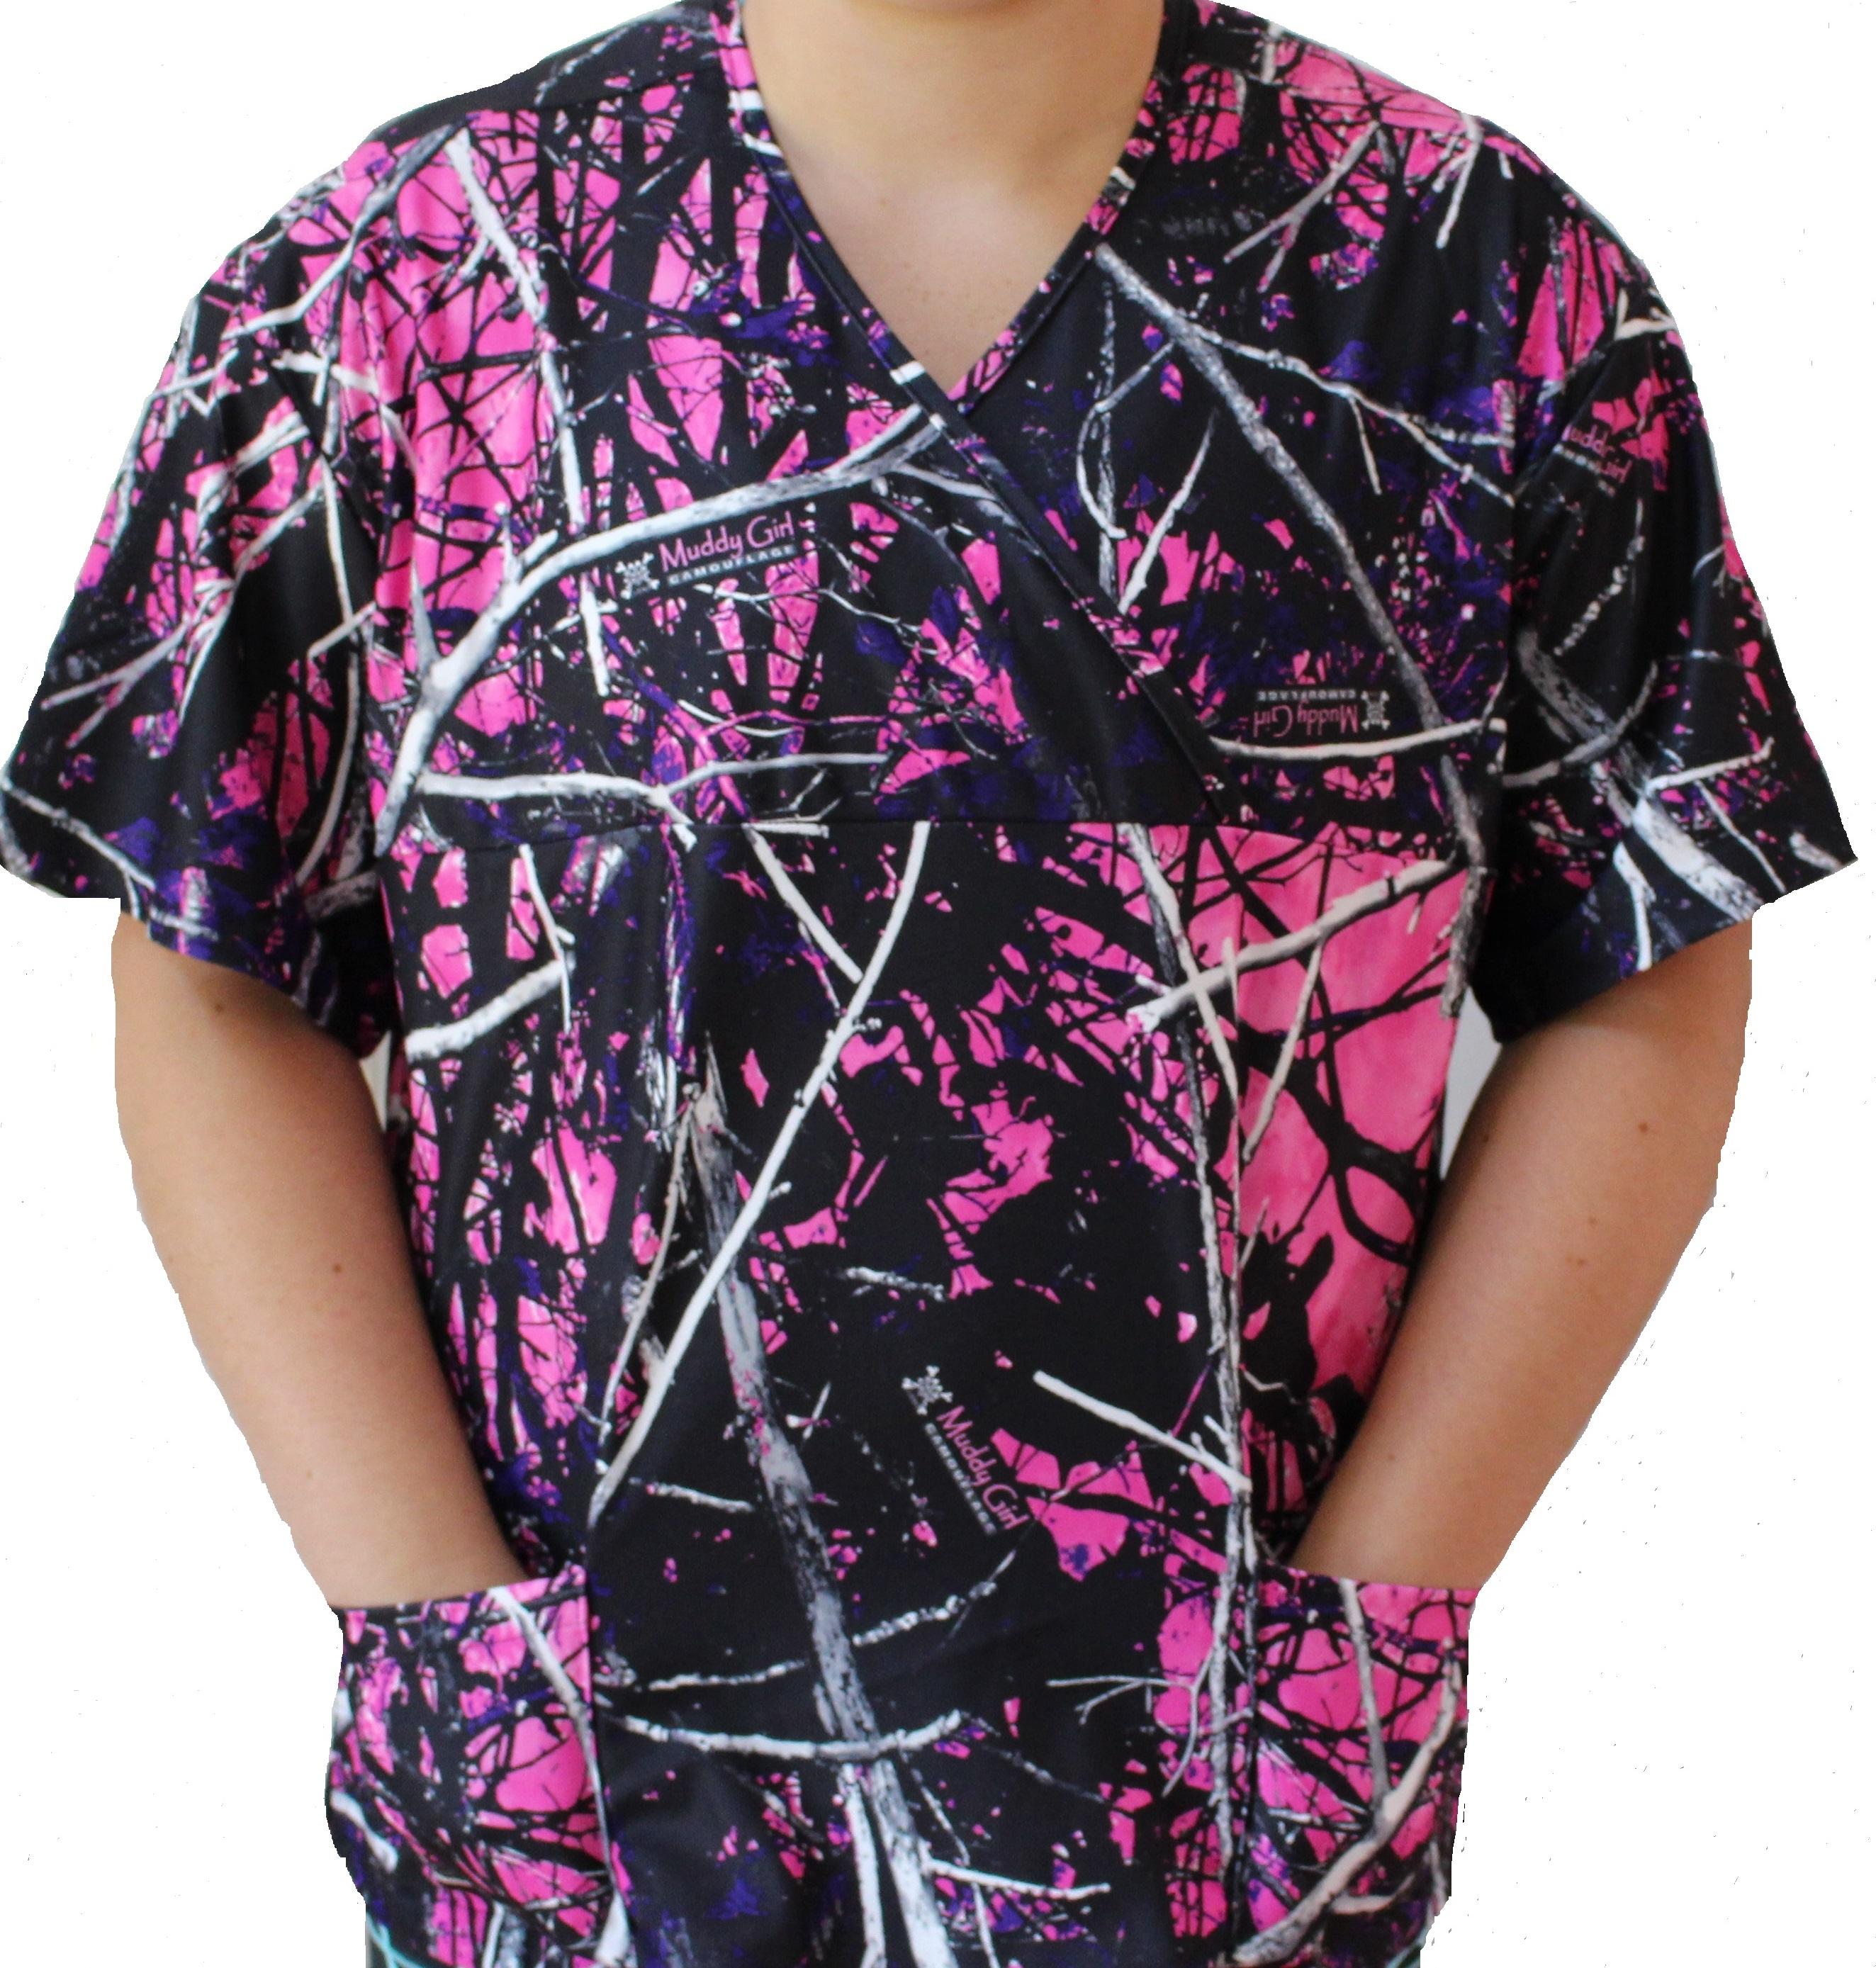 c16de9a0860 Muddy Girl Camo Scrub Top pink purple white nursing topThe Formal ...